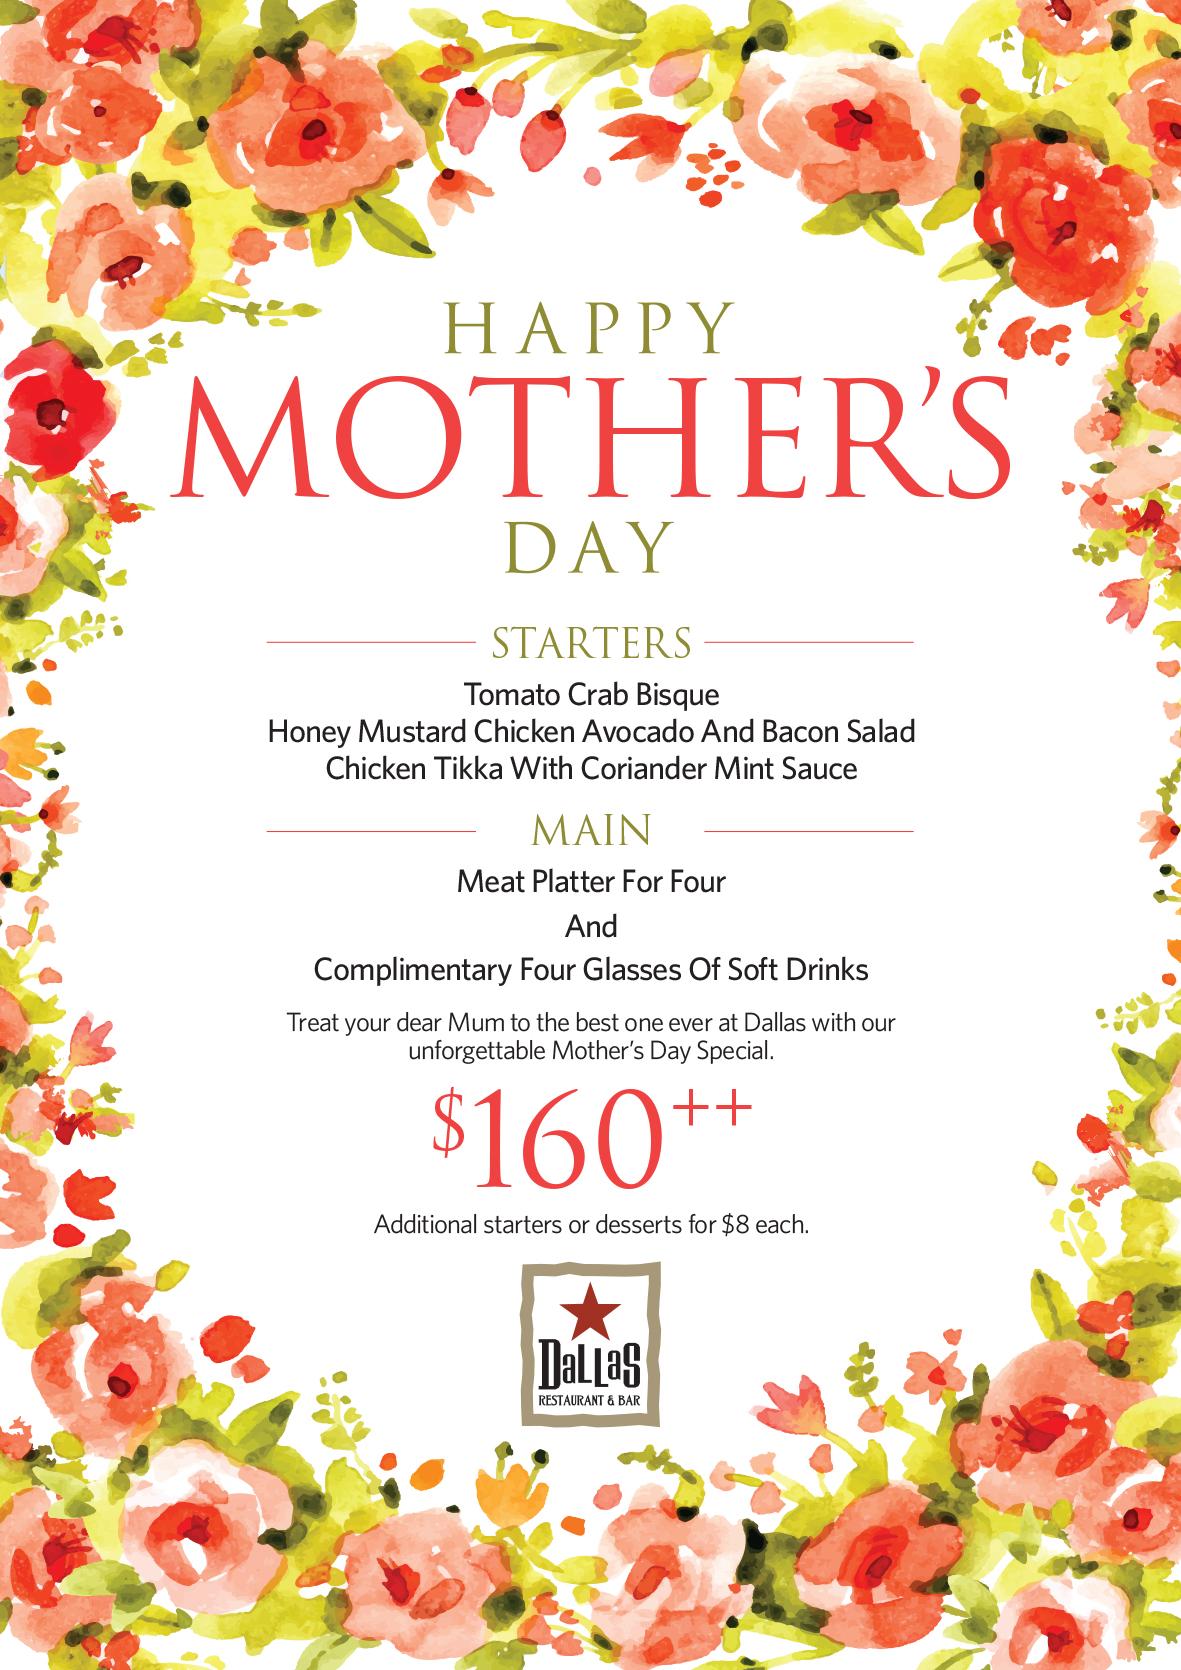 DSC Mother's Day 2017 A3 Poster V5.jpg